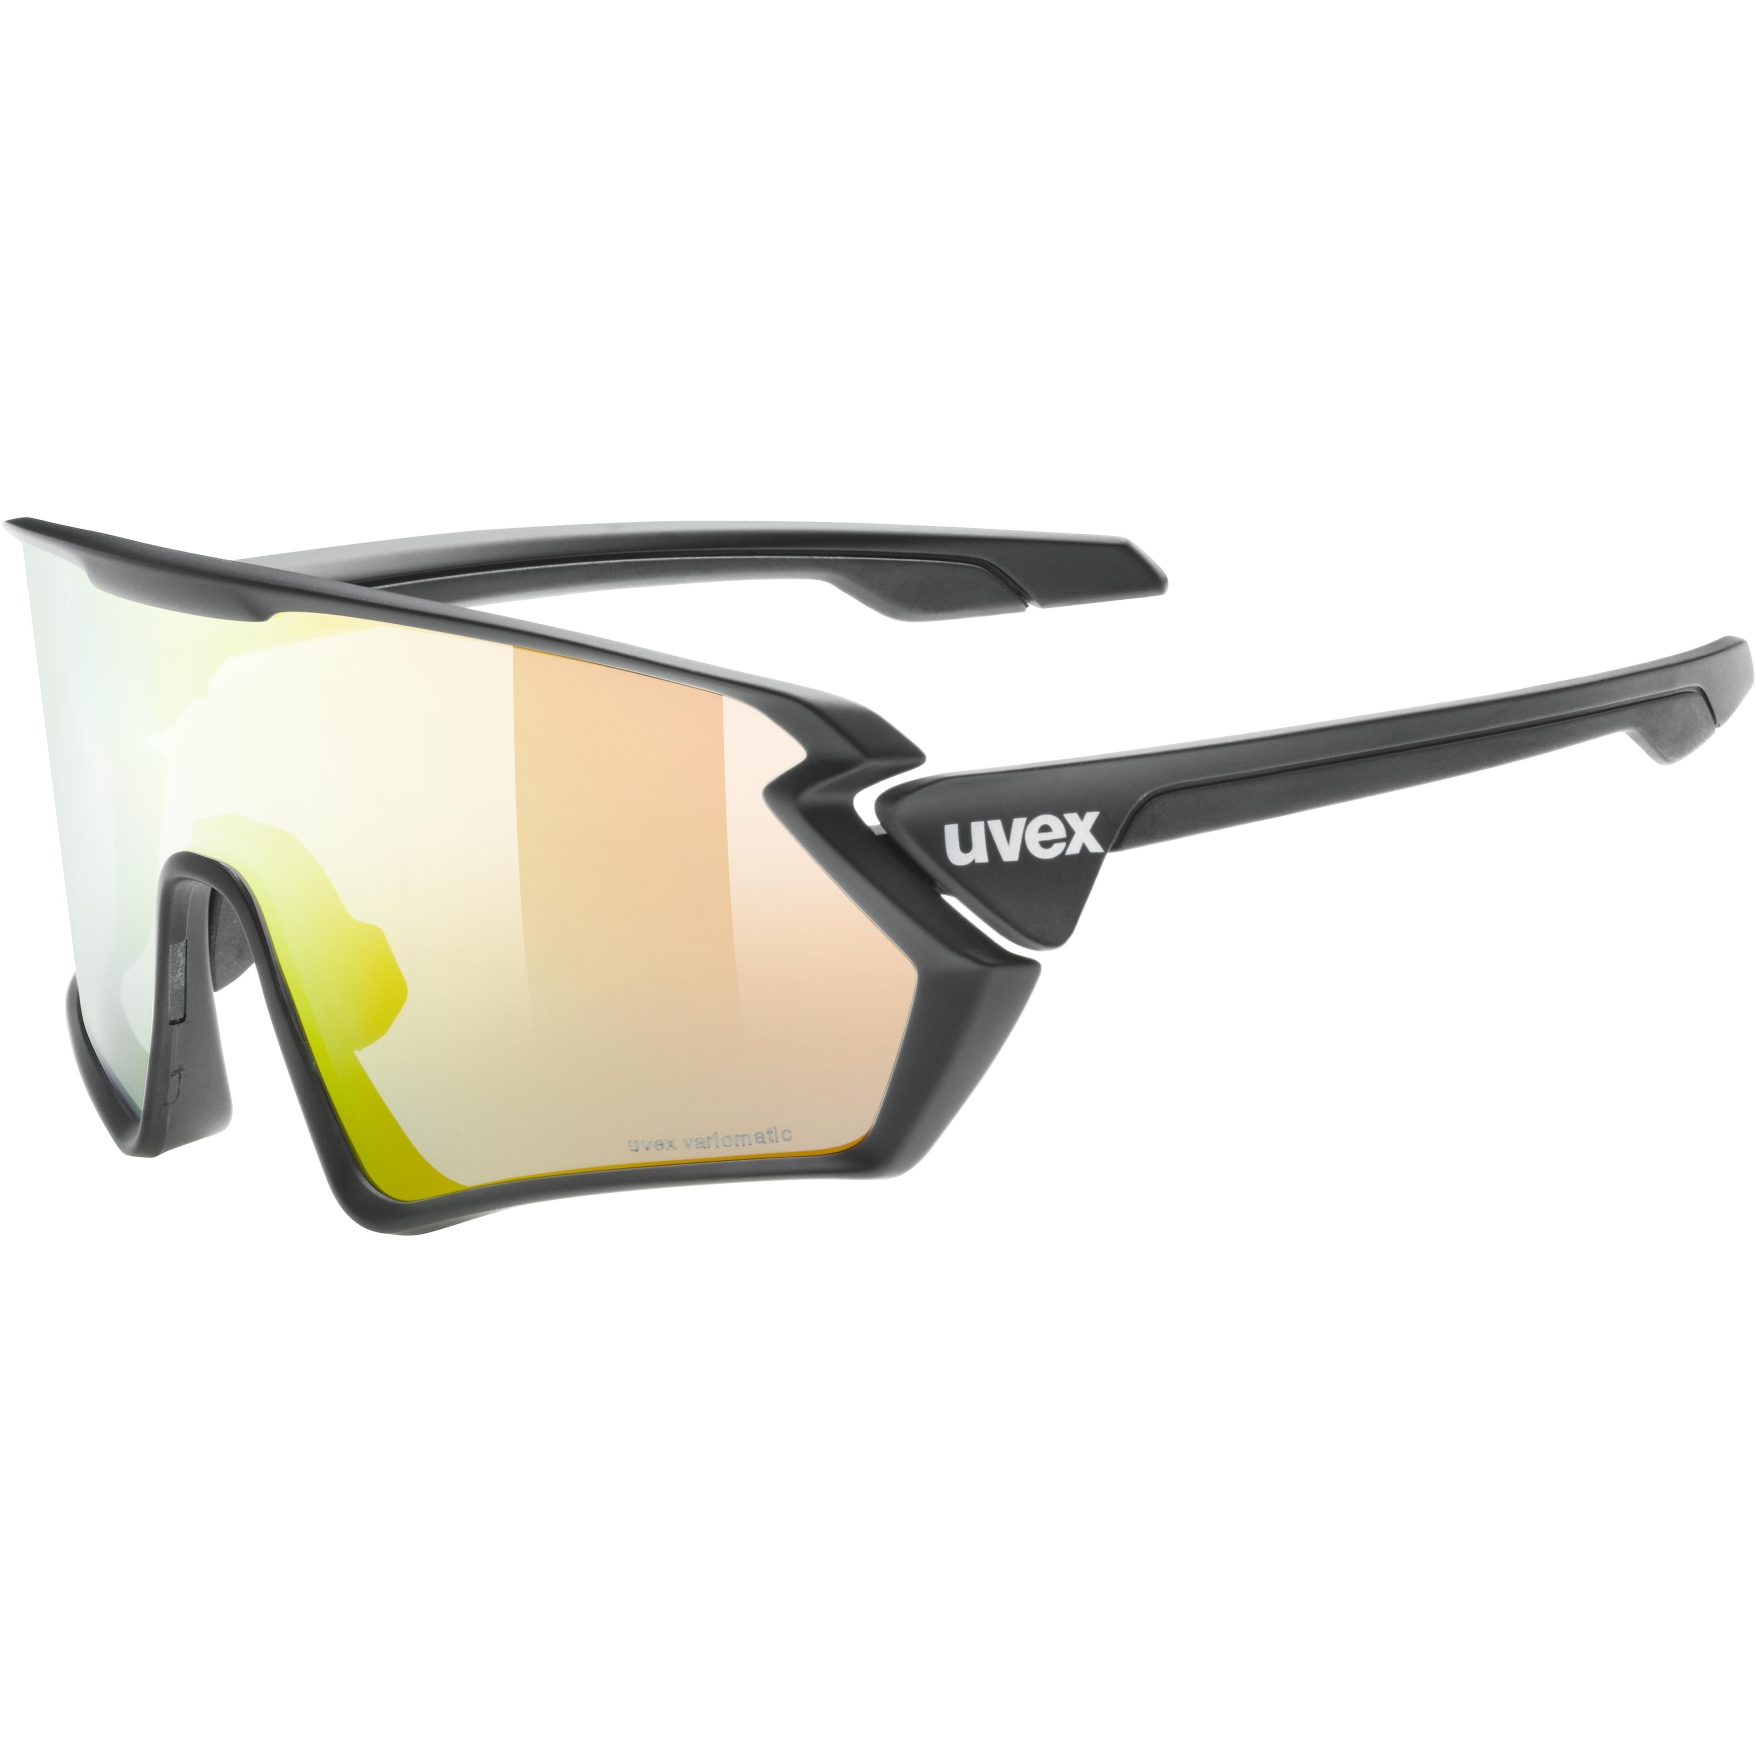 Uvex sportstyle 231 V variomatic Glasses - black mat/variomatic litemirror red + clear